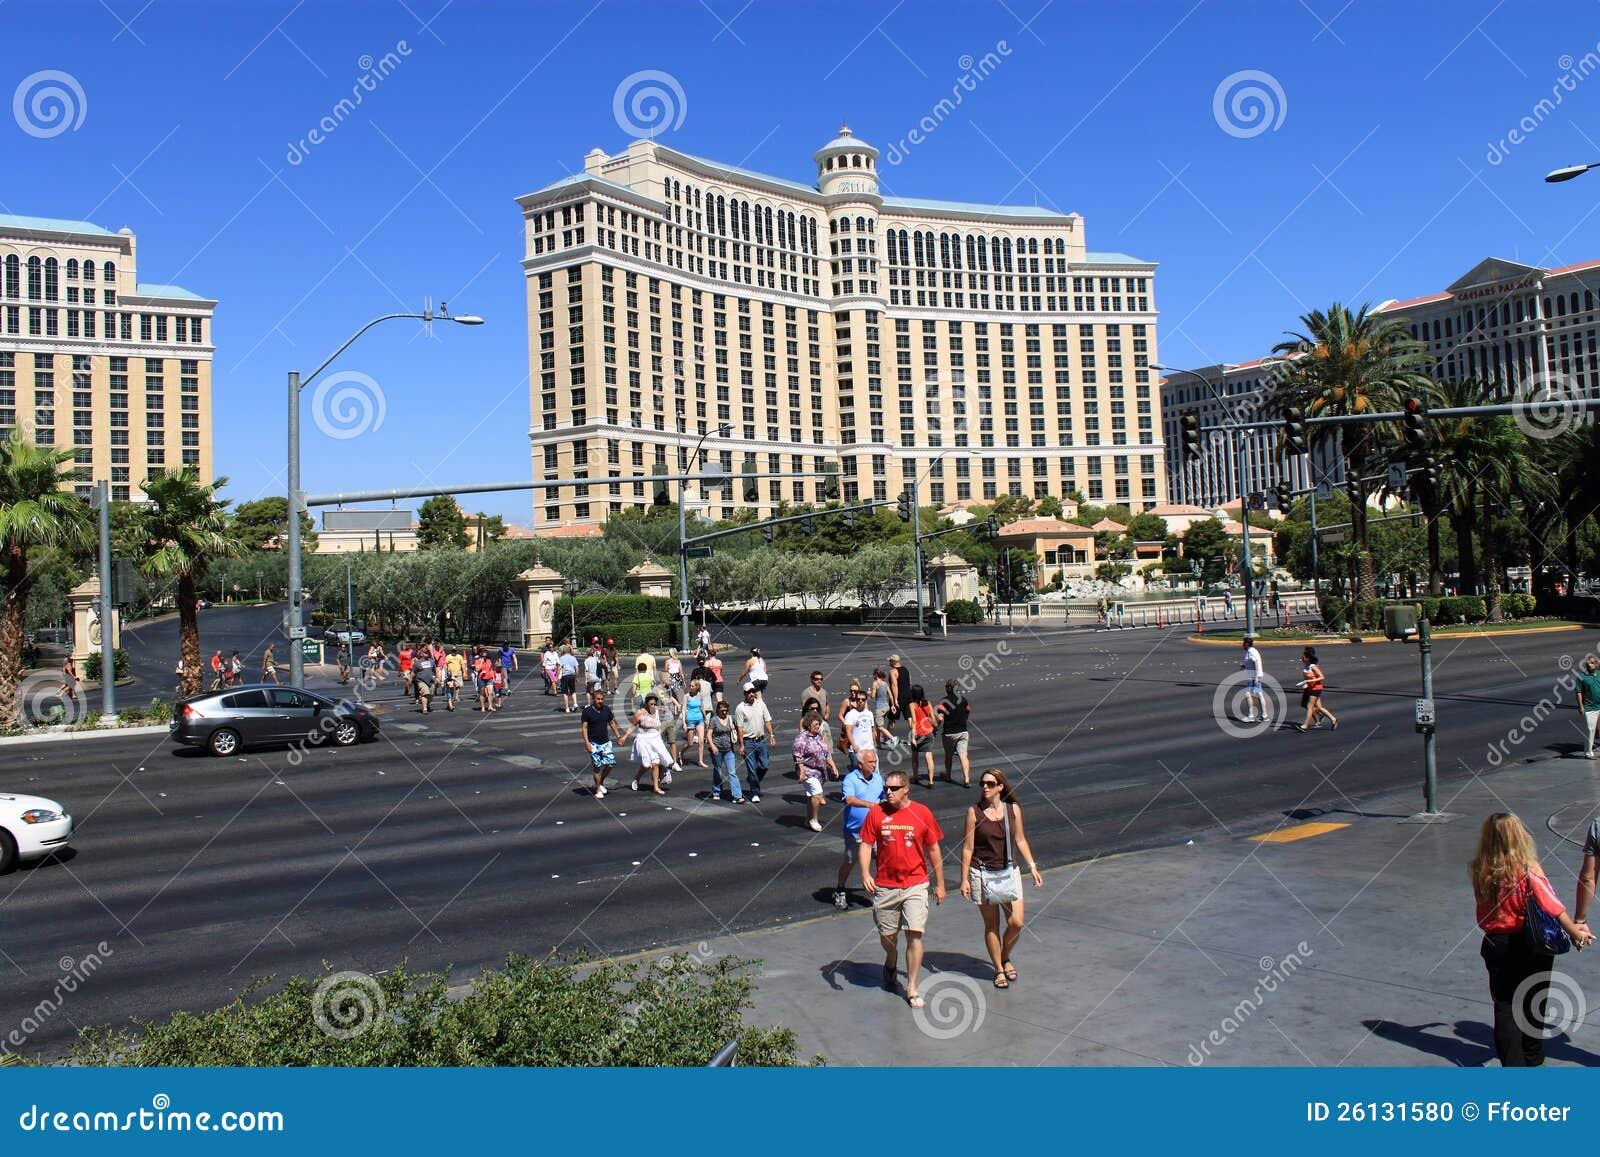 Casino henderson nv 11